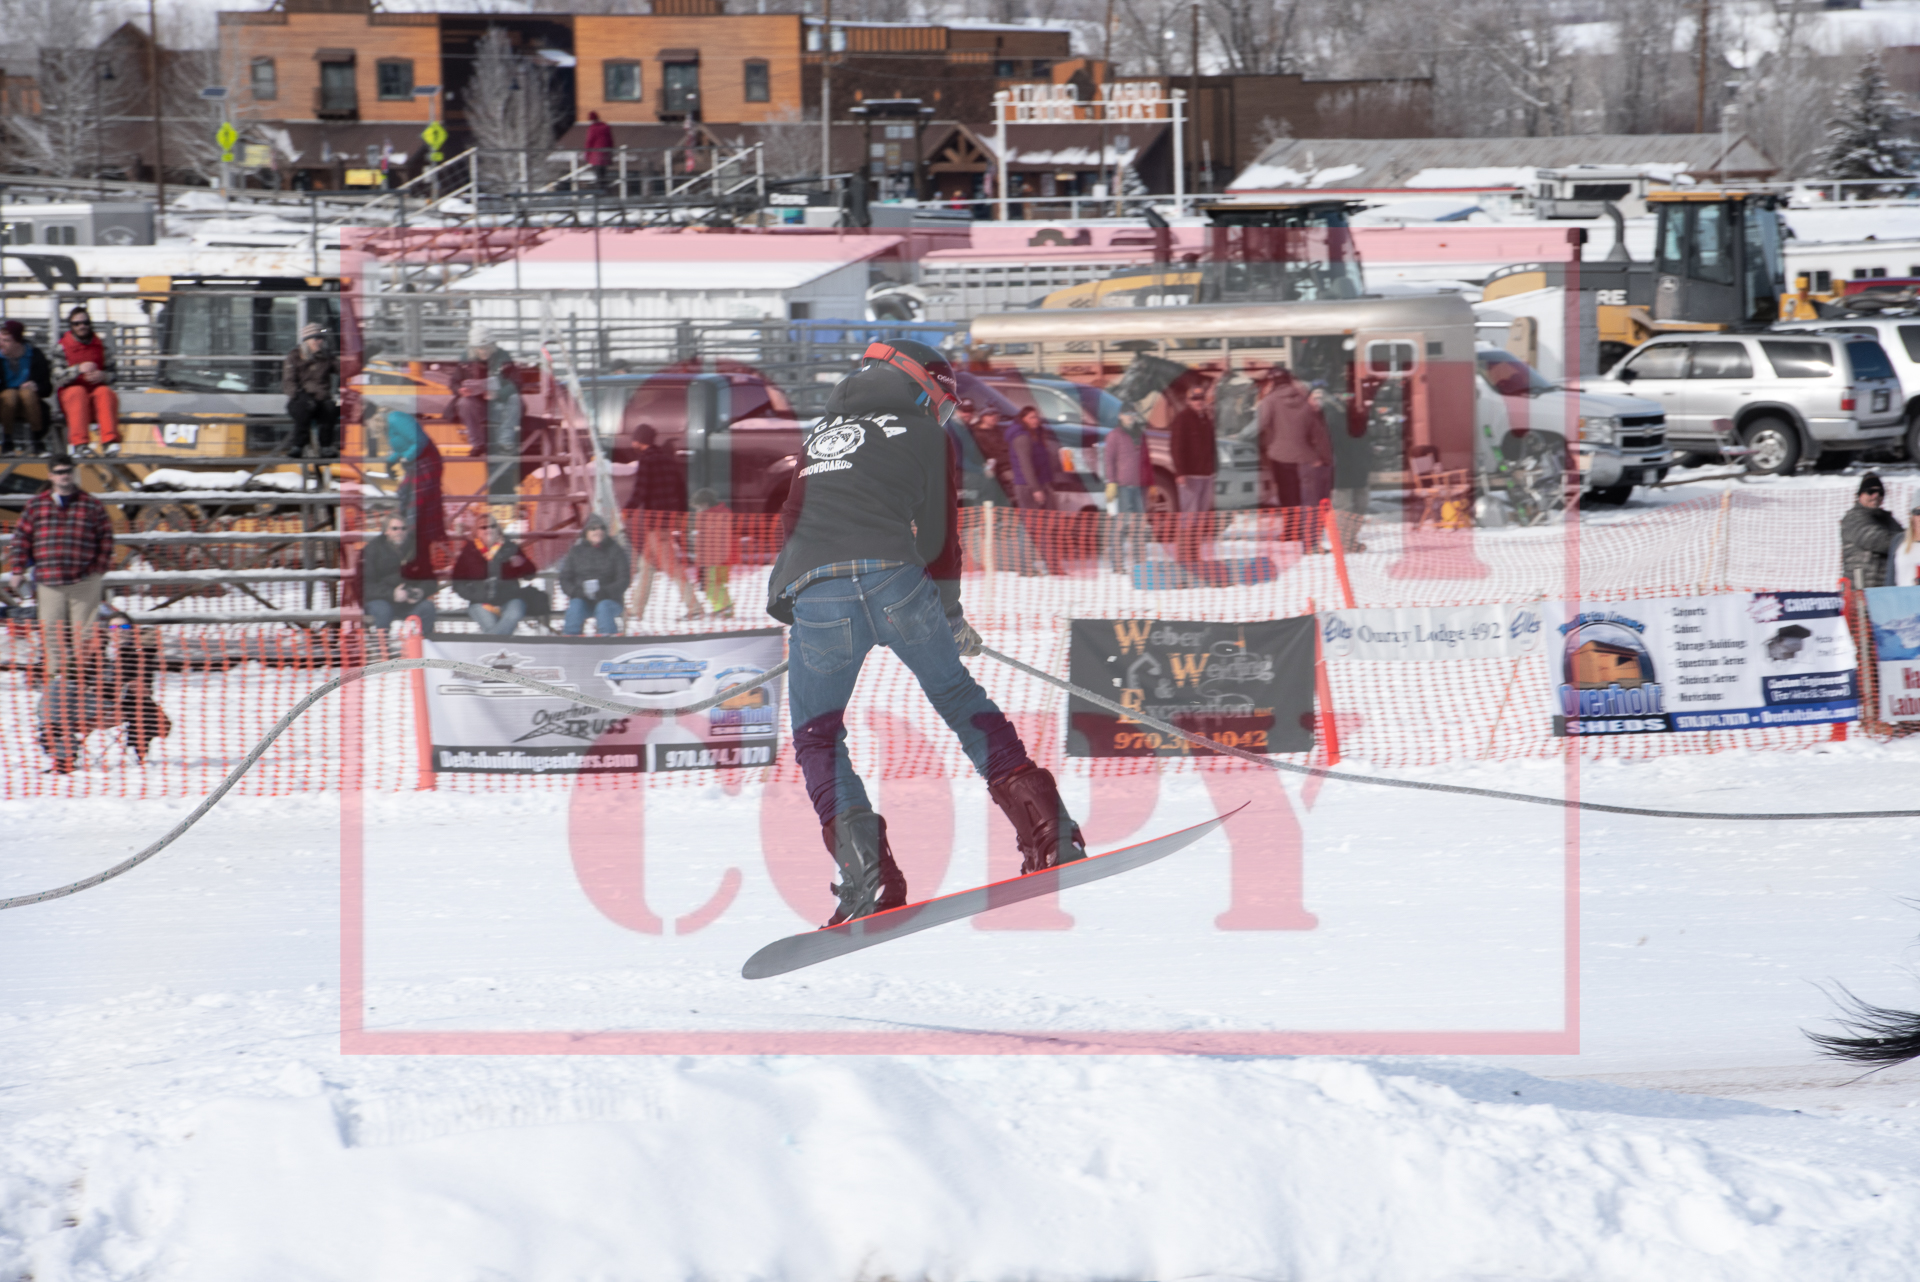 - Amanda Sandau - Snowboard 7